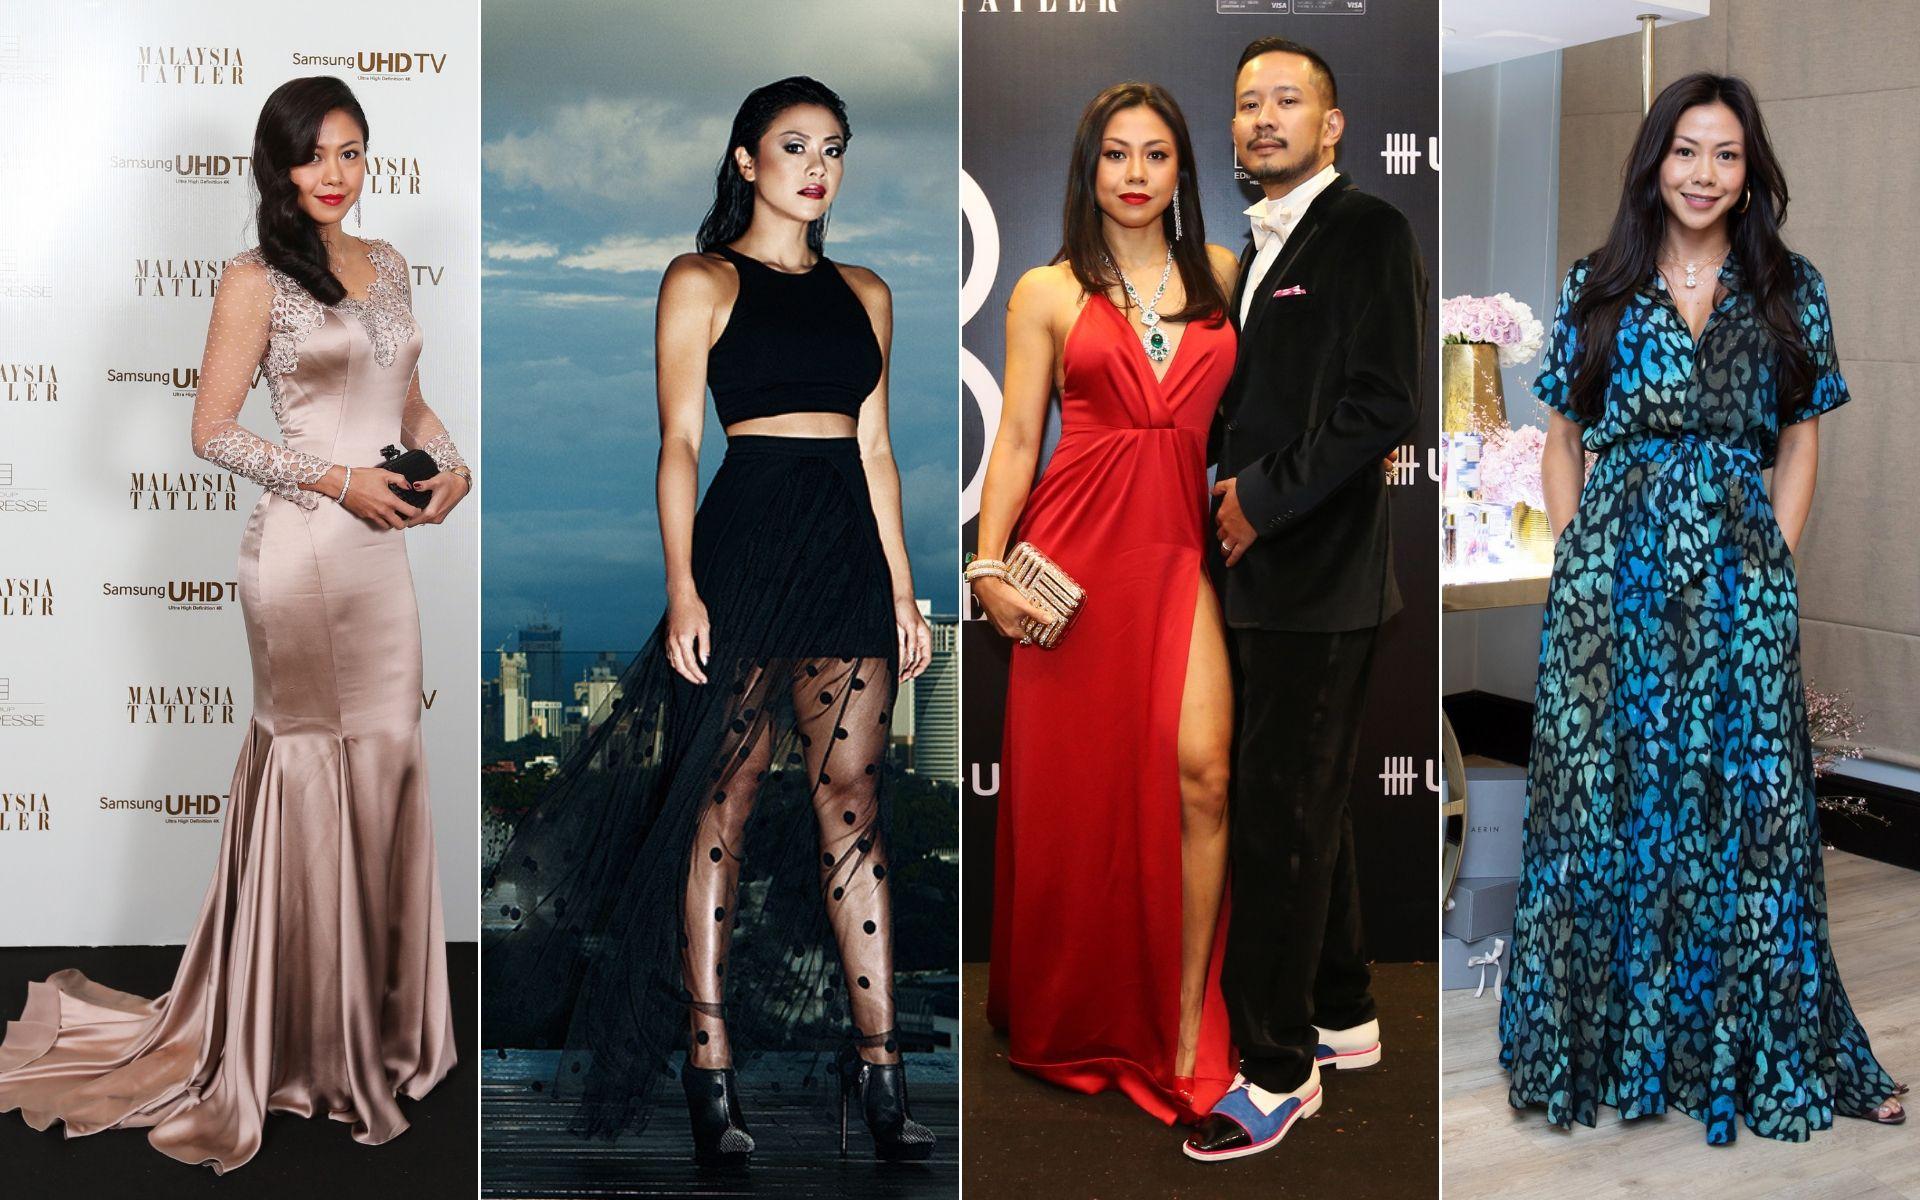 2013 - 2019: An evolution of Datin Wira Sabrena Dani's style